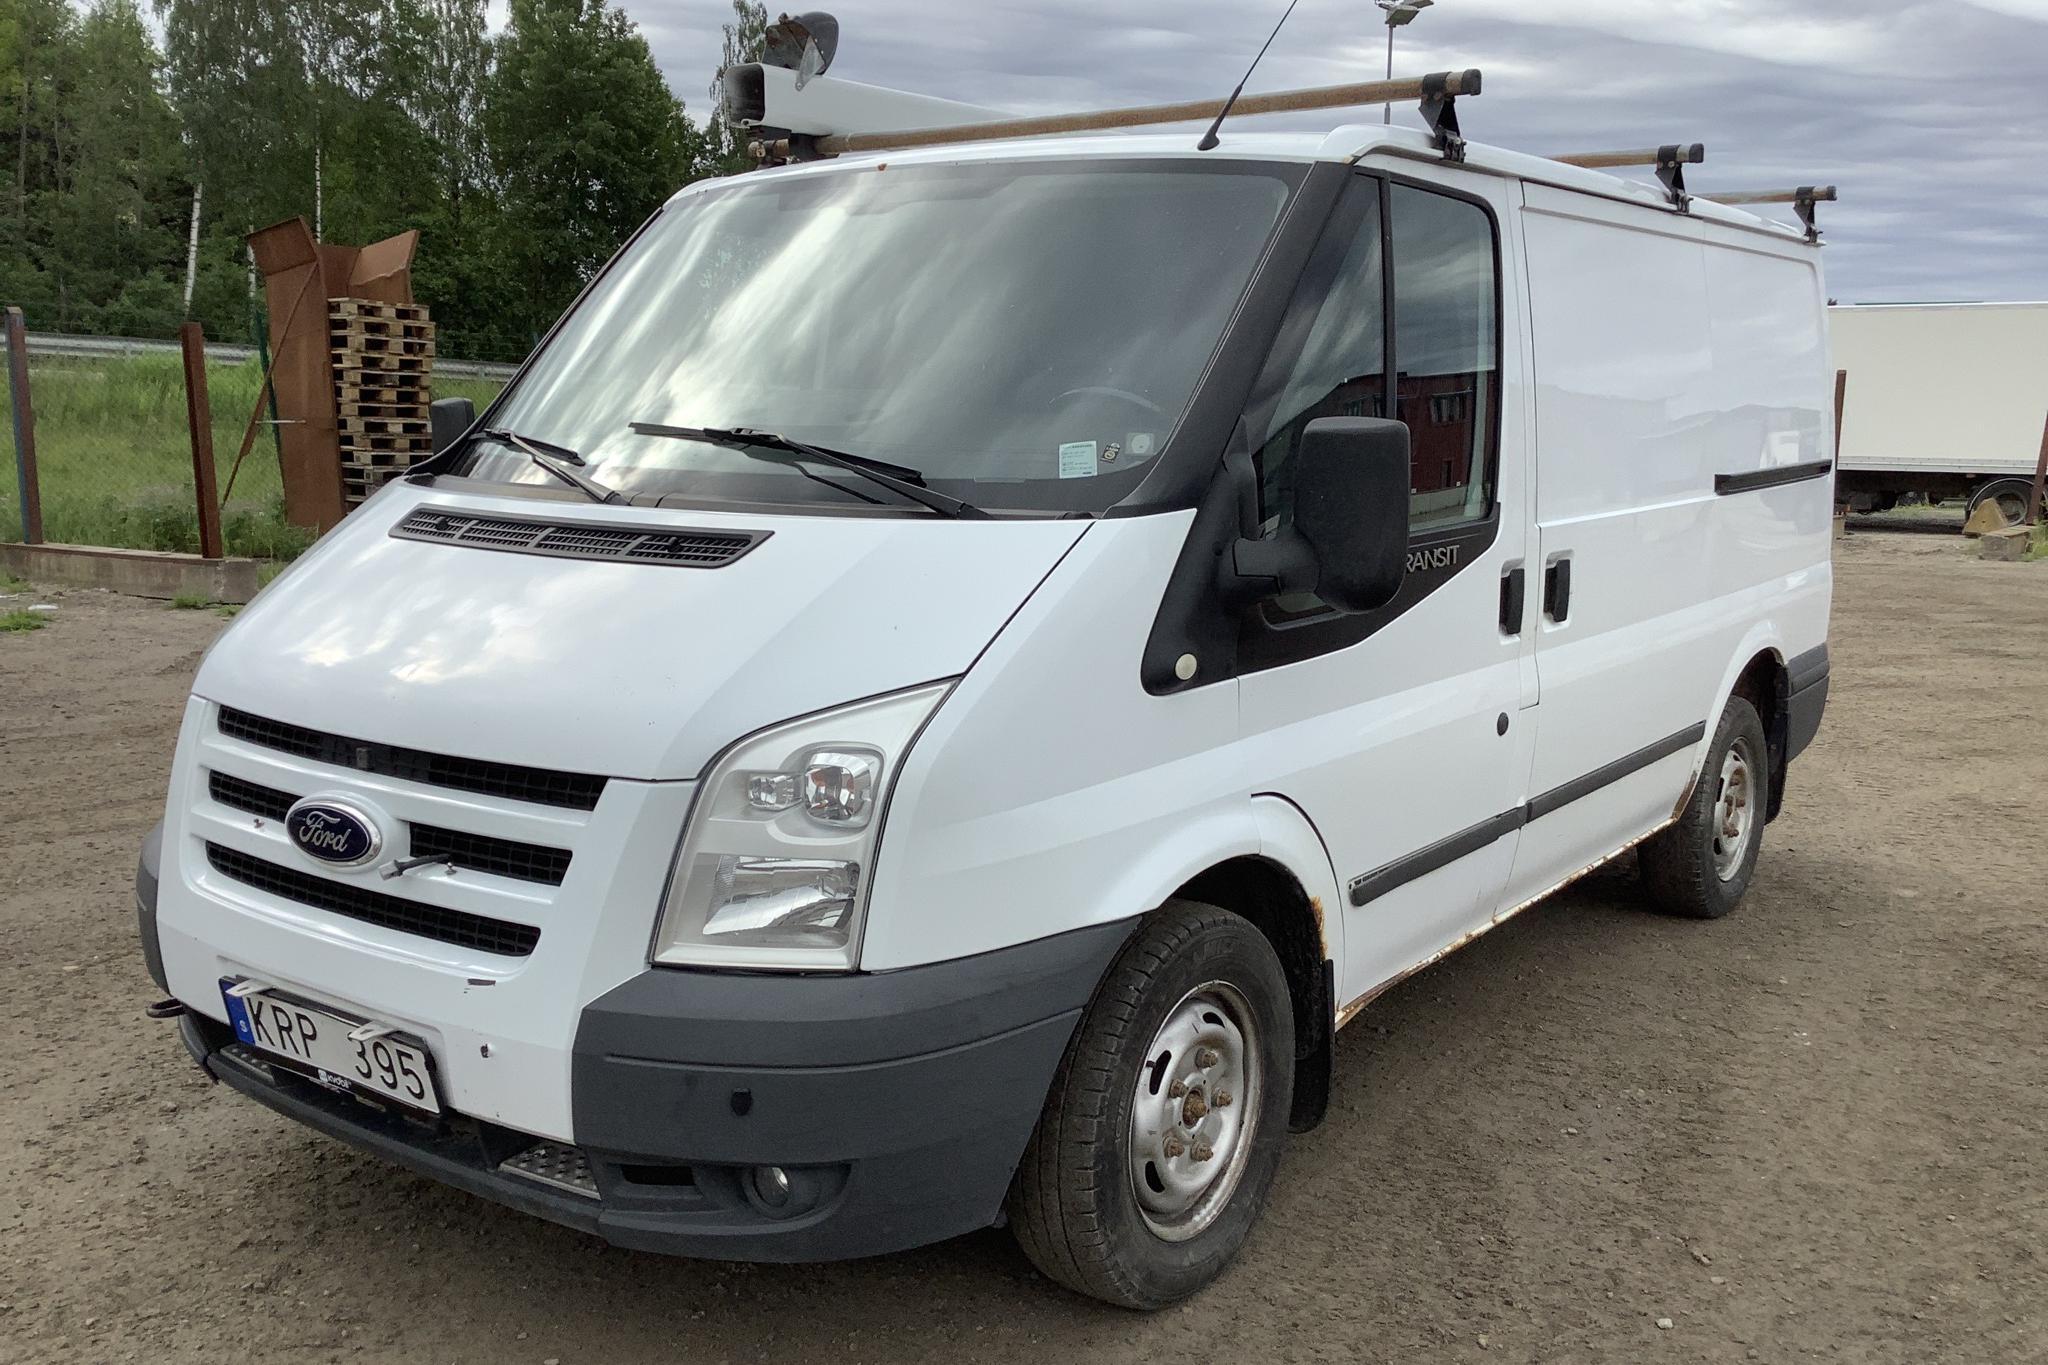 Ford Transit 280 2.2 TDCi ECOnetic Skåp (115hk)